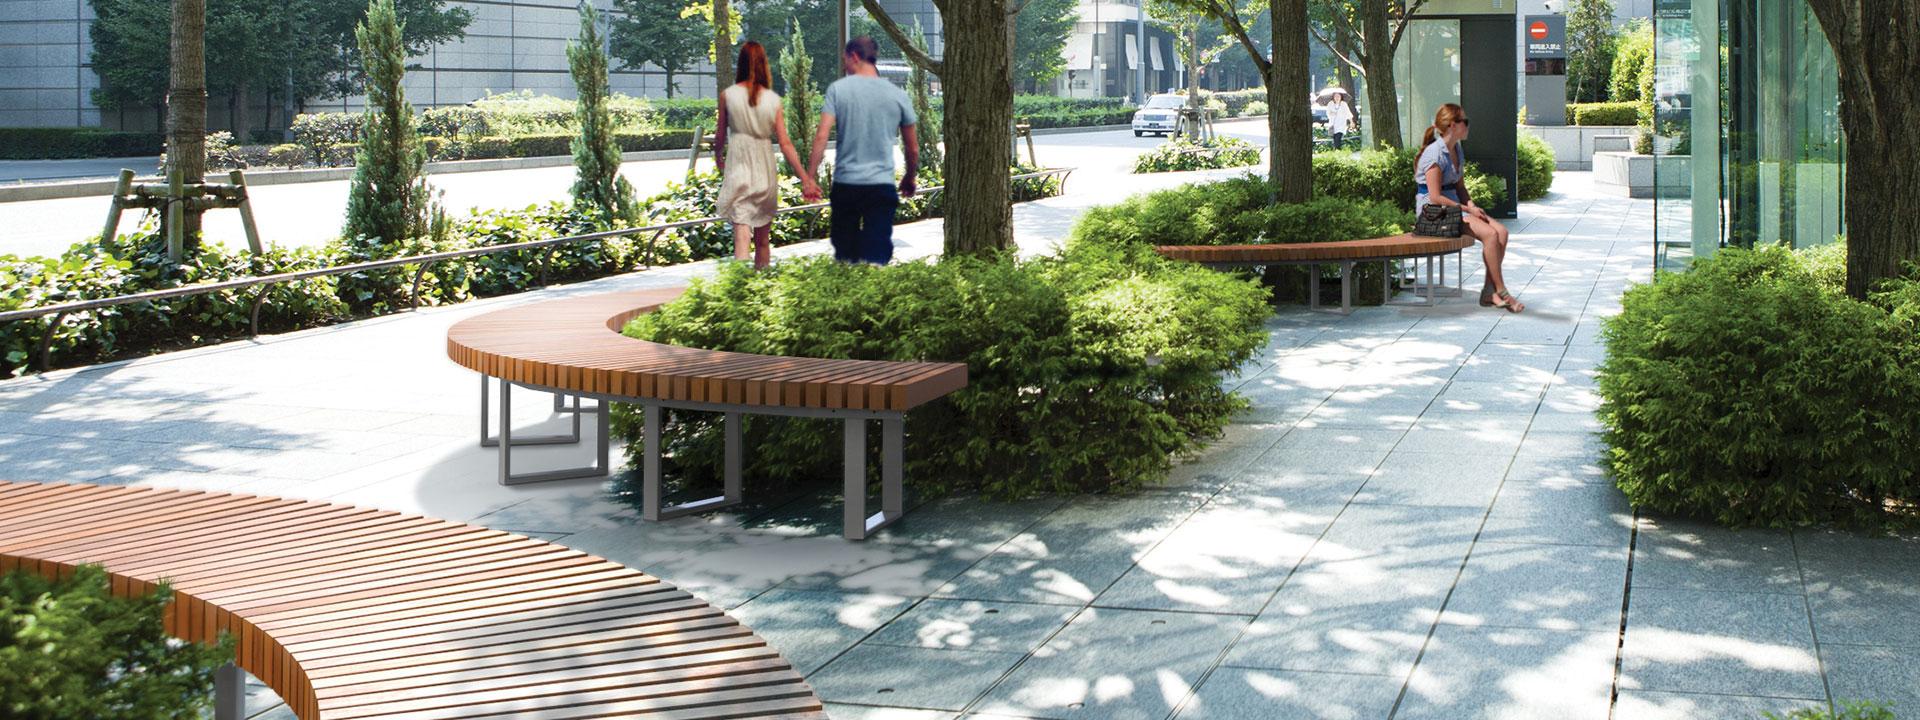 Introducing Cobra Bench System